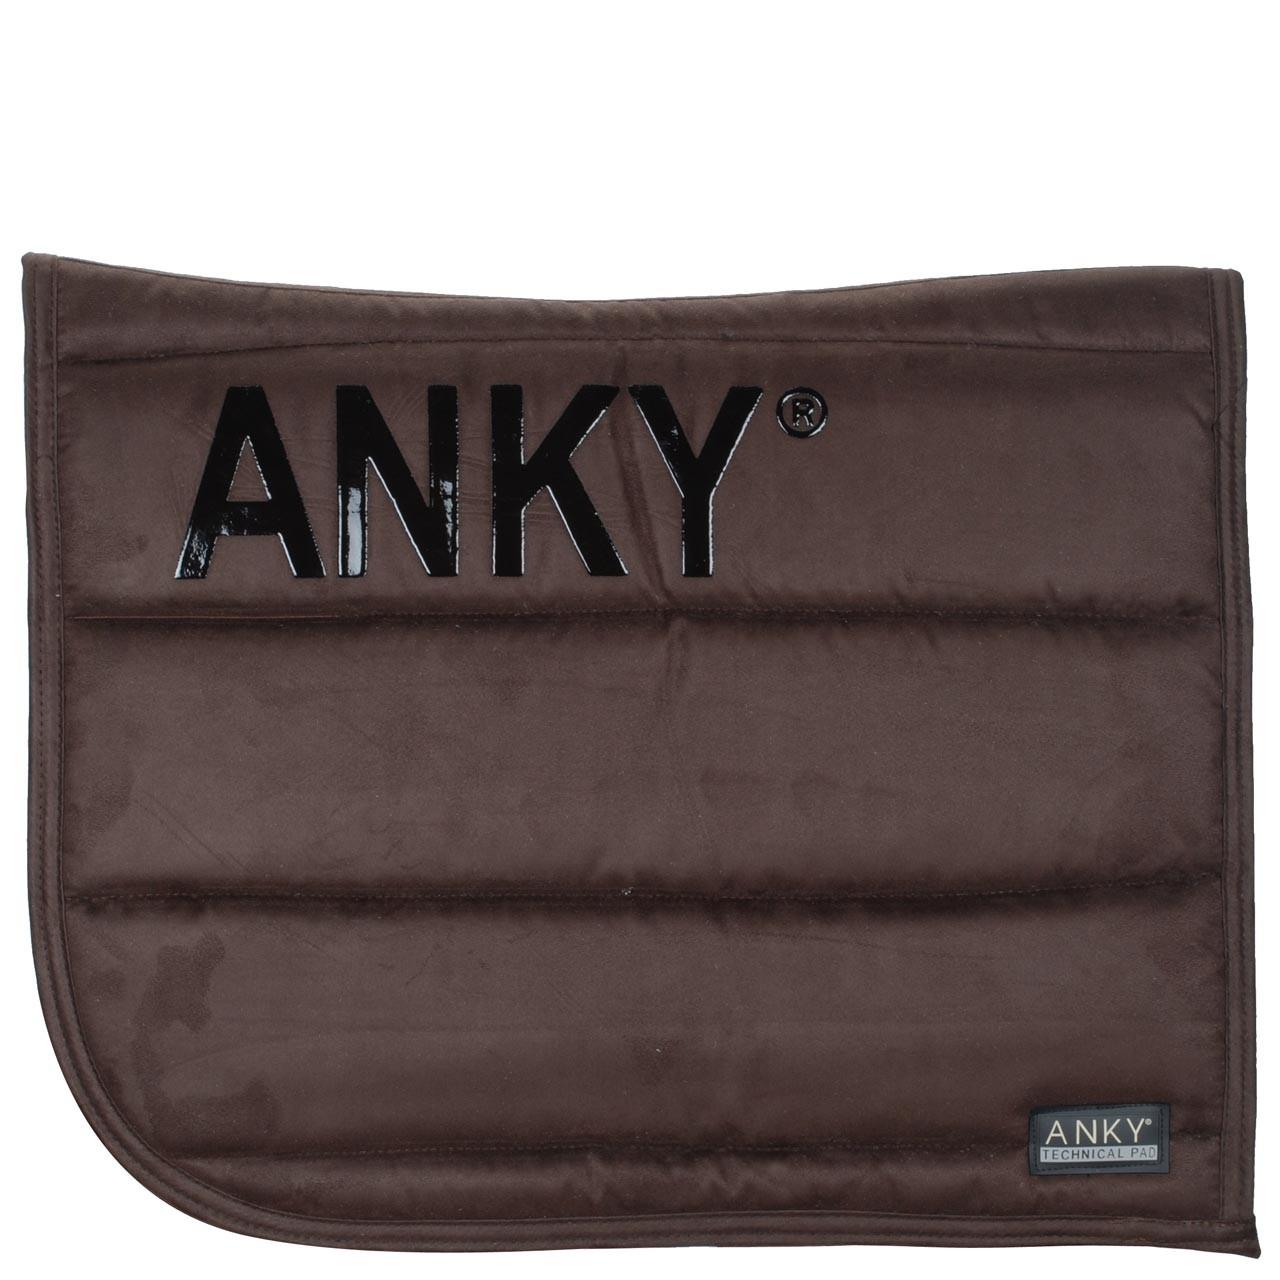 Anky Basis pad donkerbruin maat:full